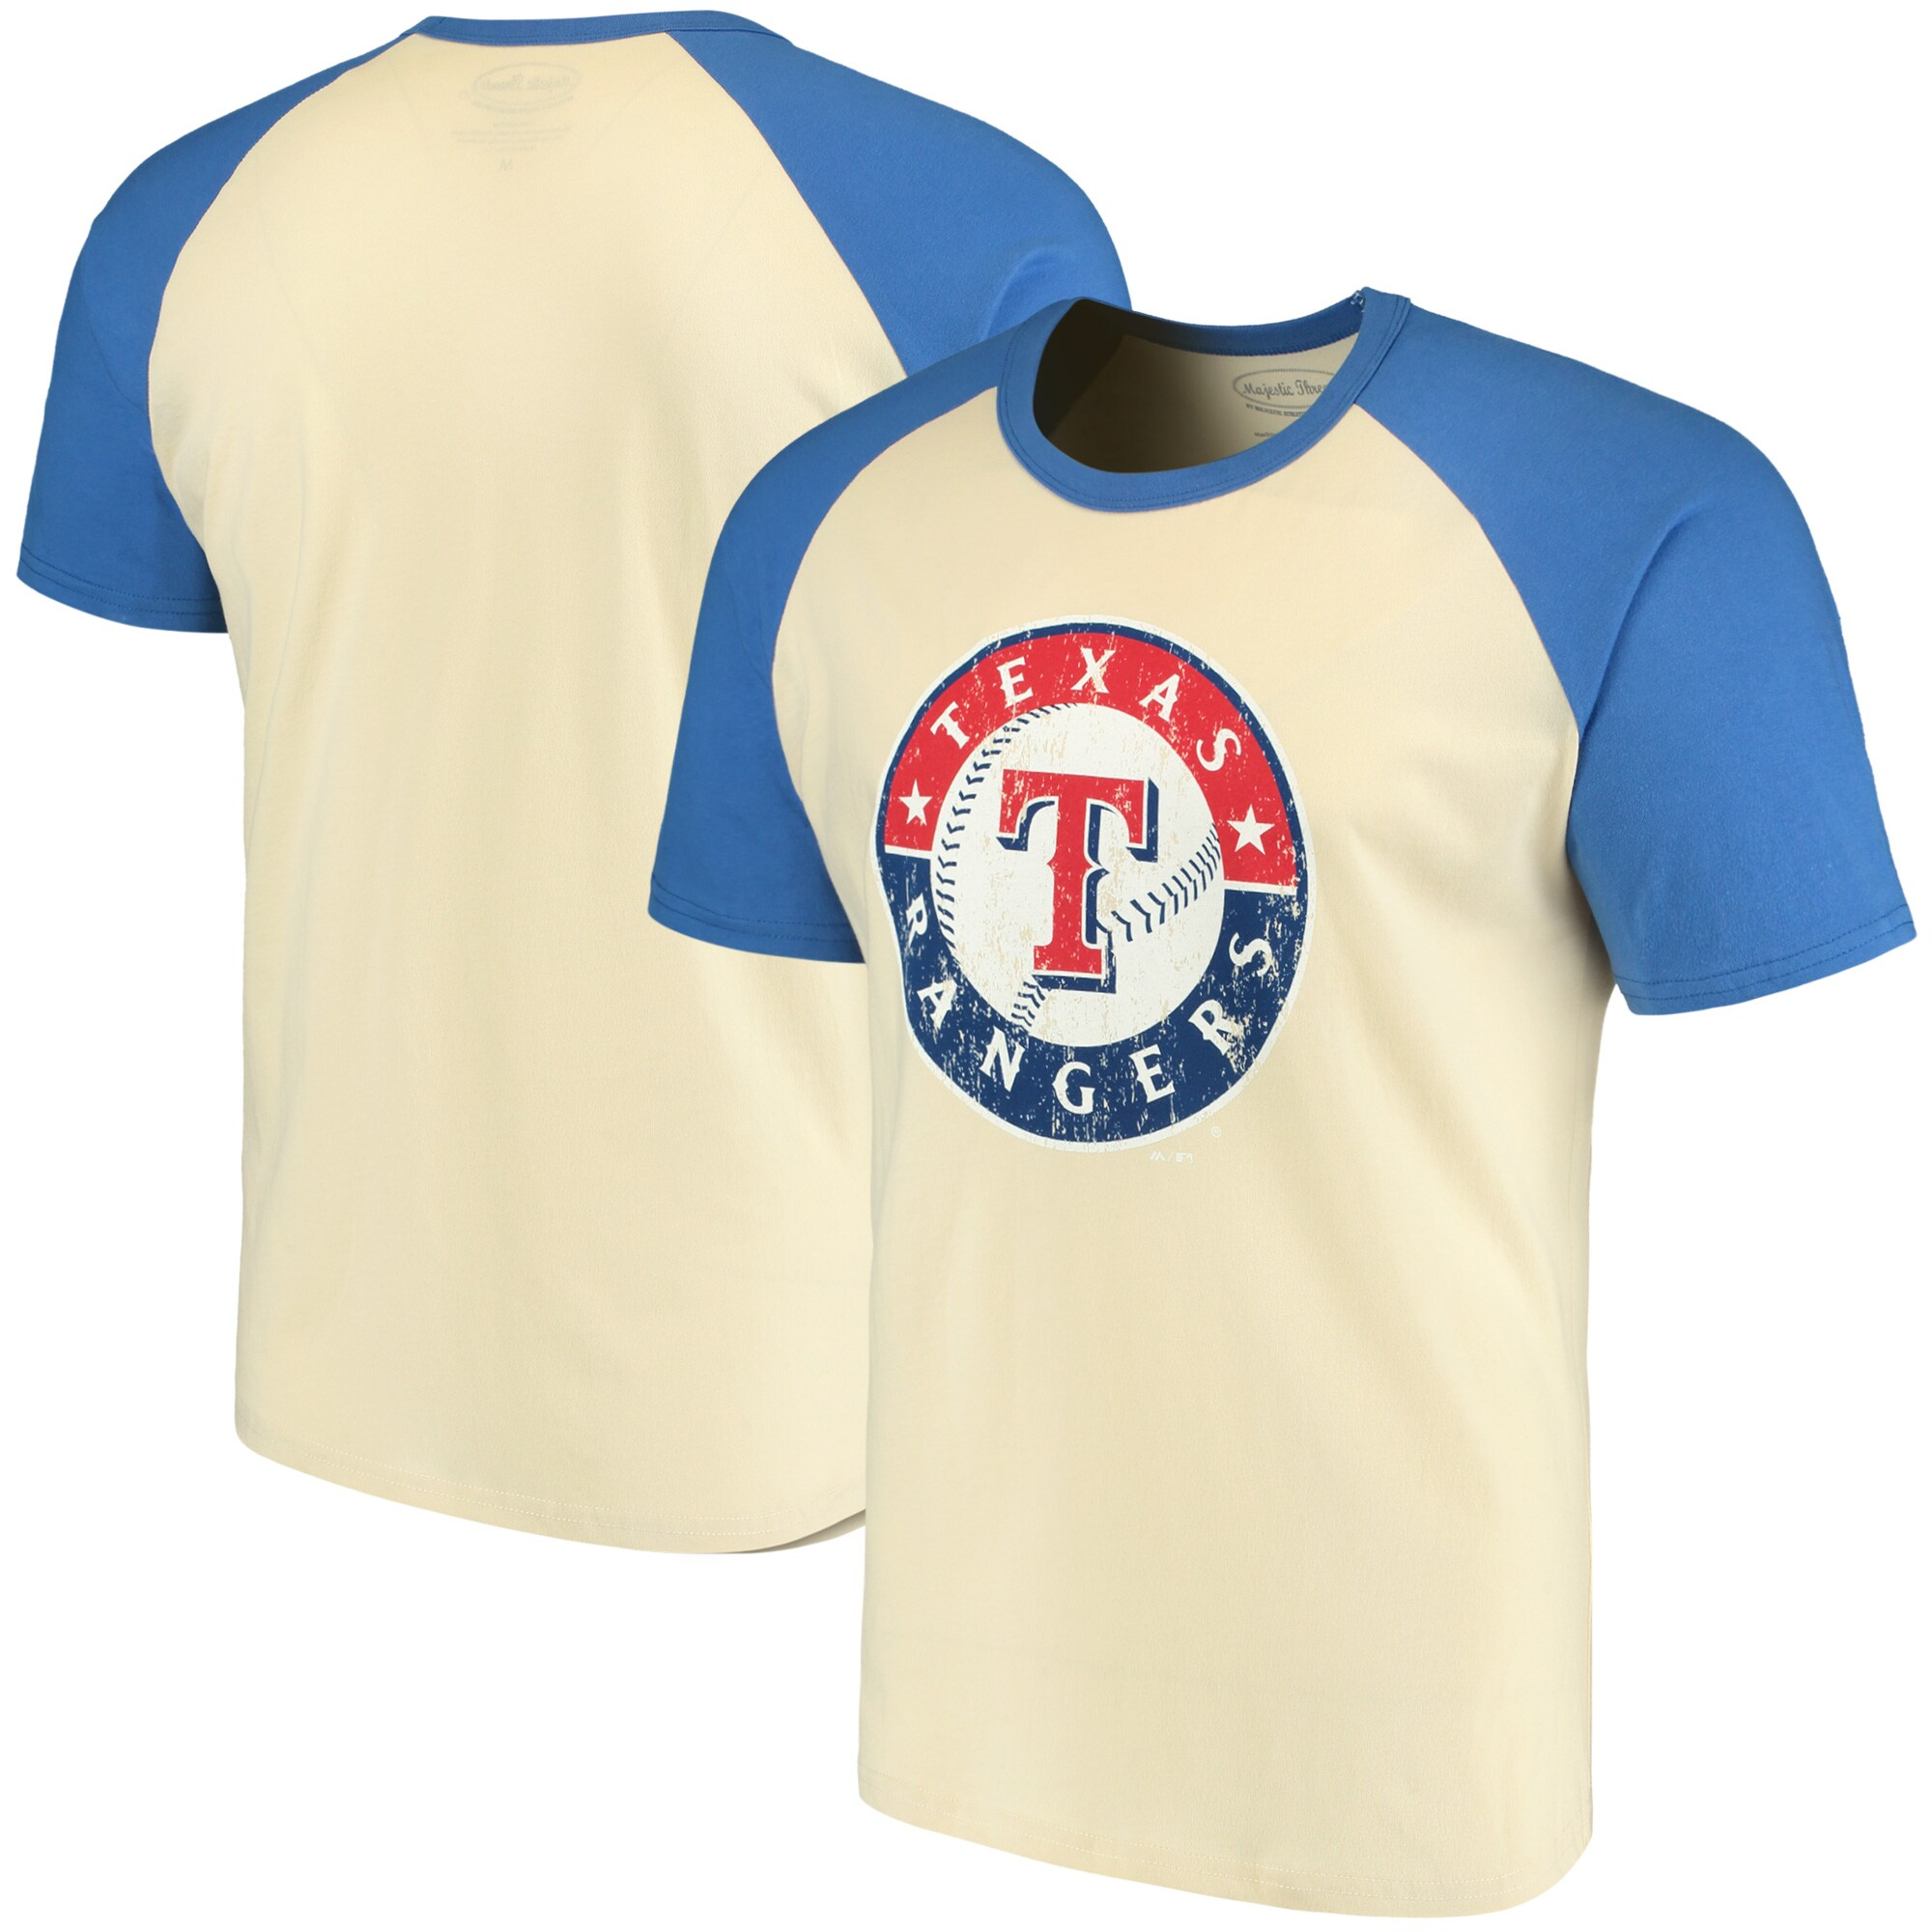 Texas Rangers Majestic Threads Softhand Raglan T-Shirt - Cream/Royal